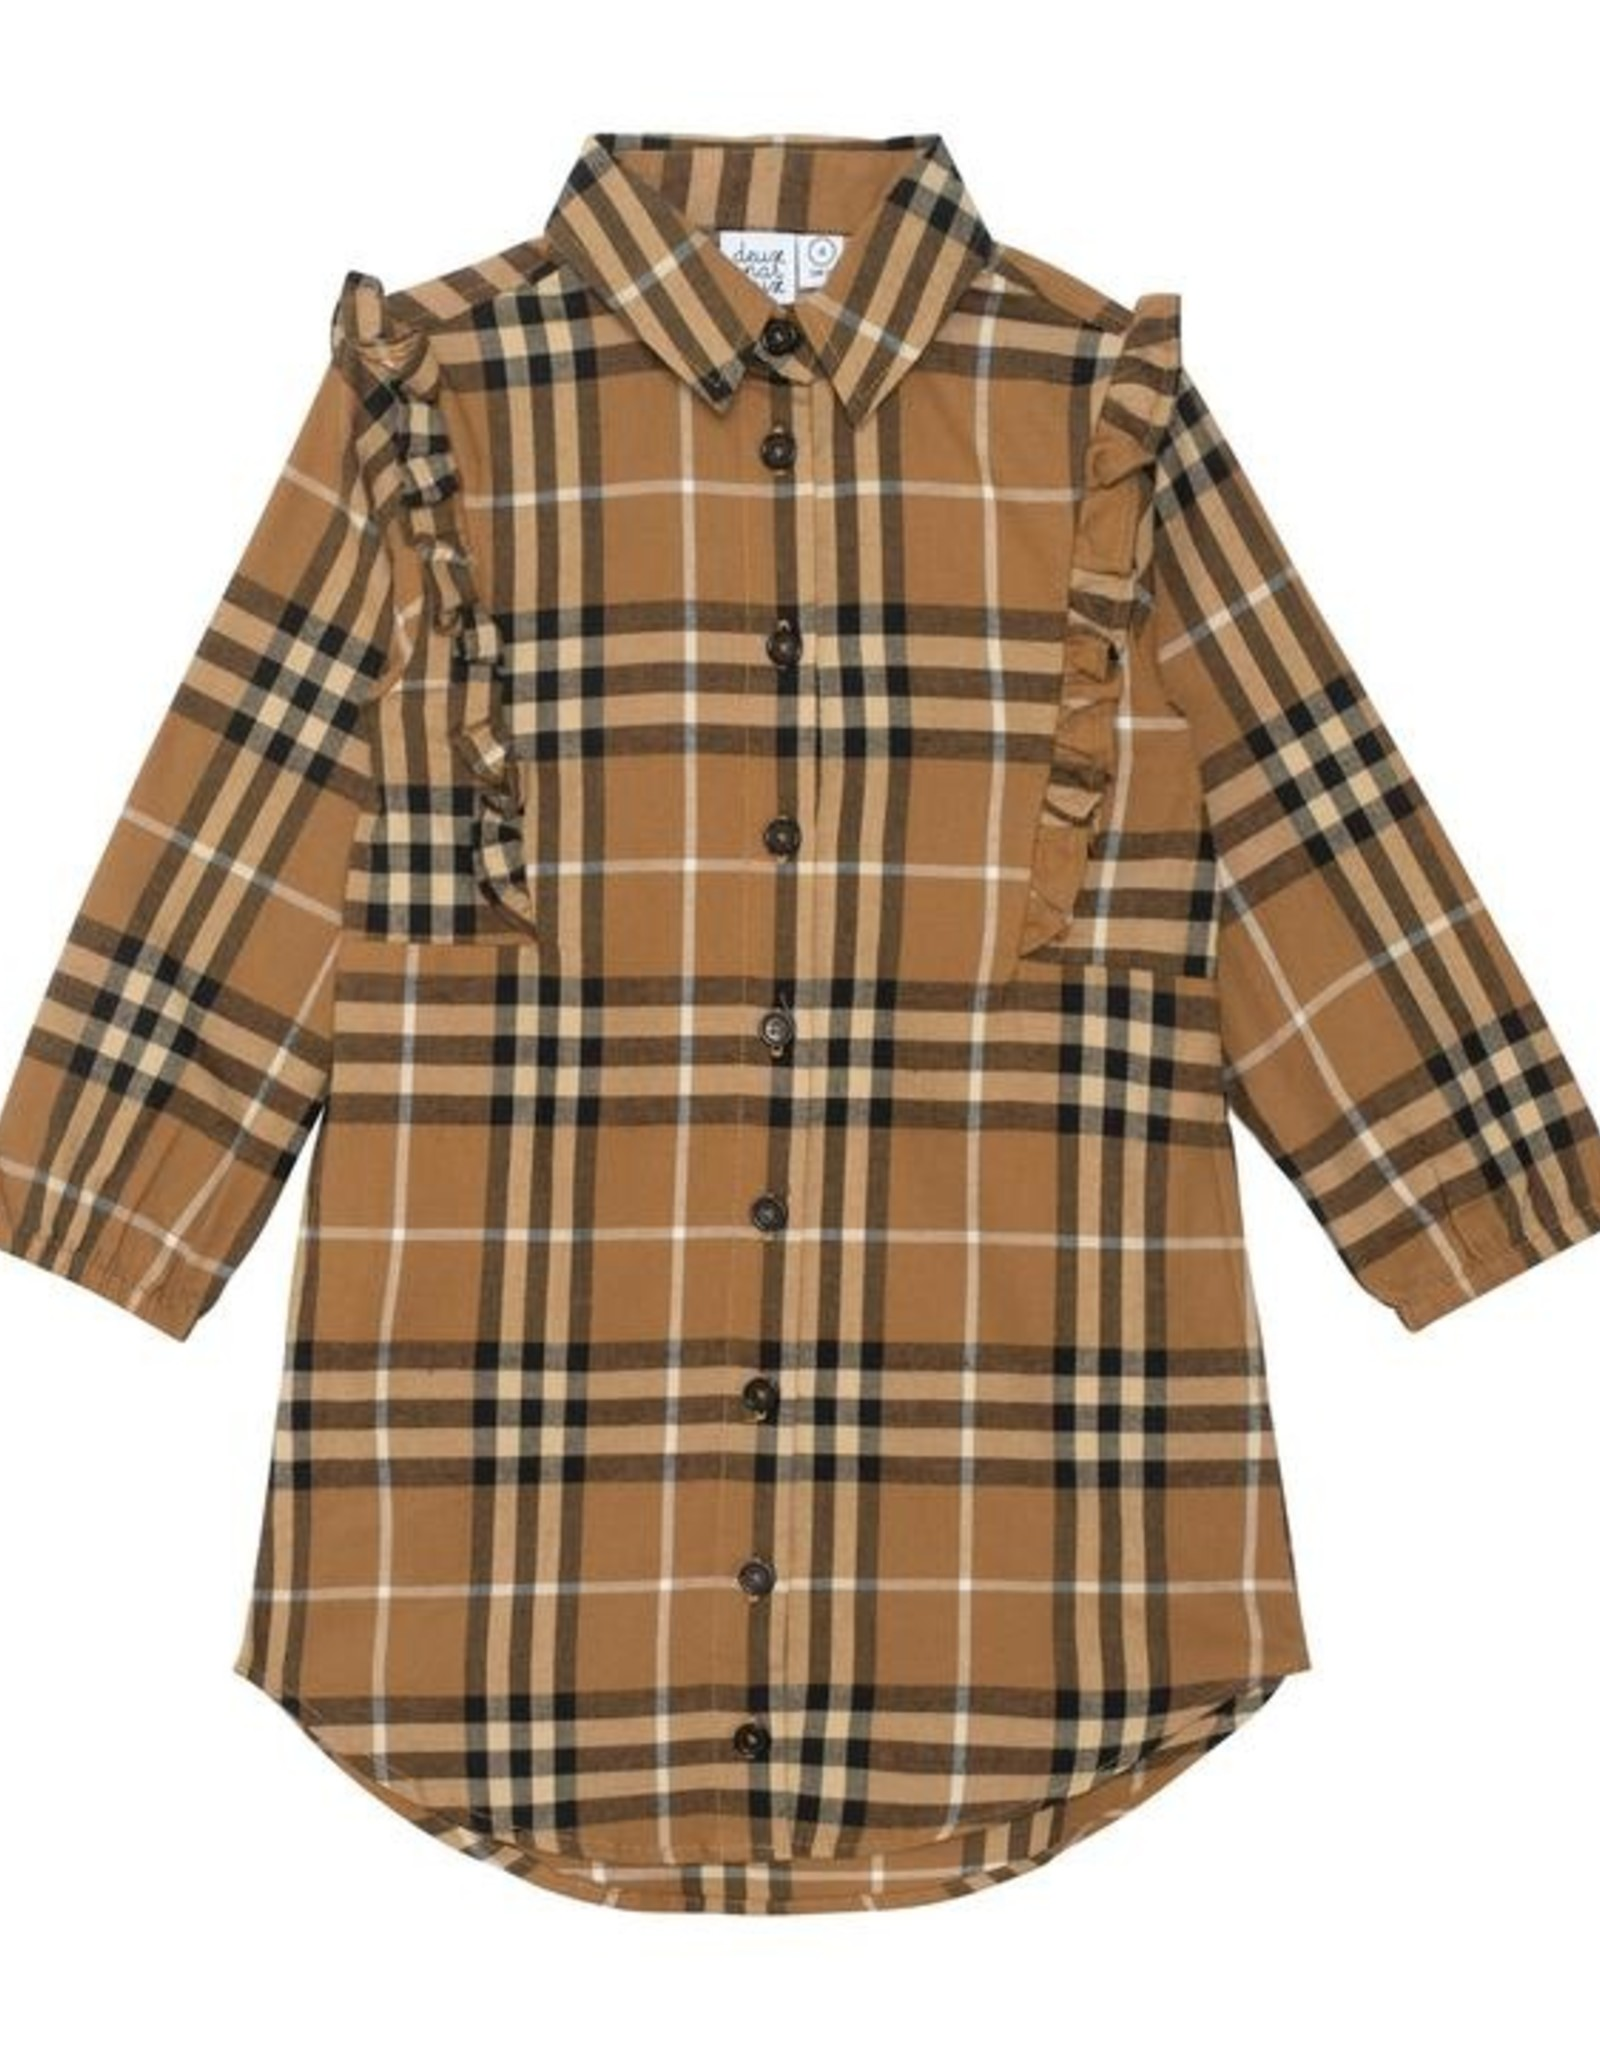 DeuxParDeux FA21 G Brown Plaid Dress w/Frill